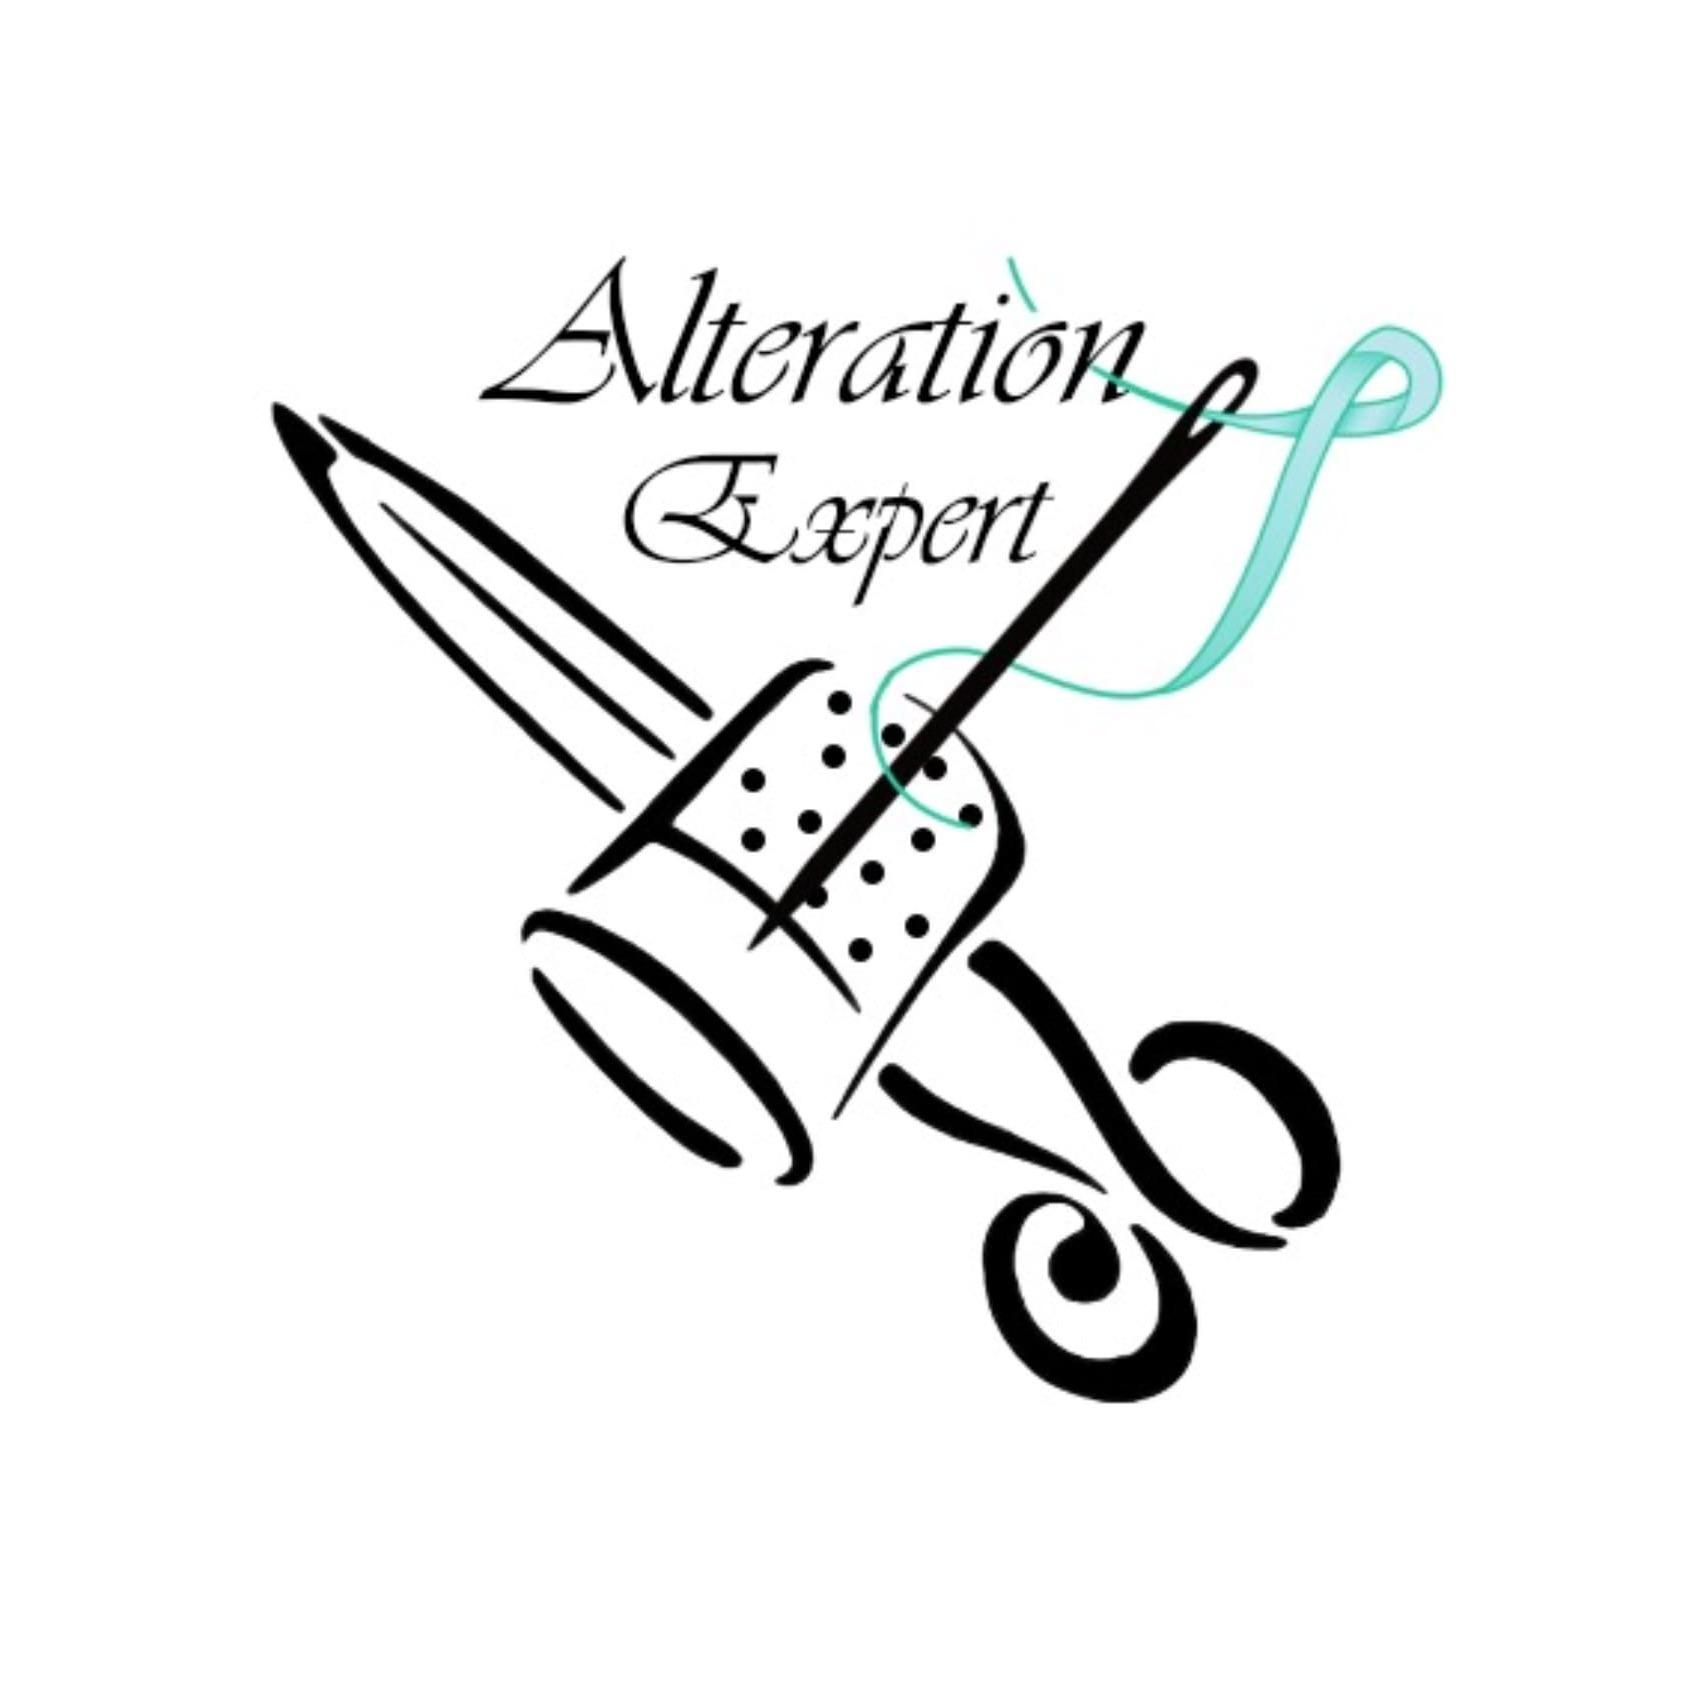 Alteration Expert - Stockport, Cheshire SK7 4DJ - 01614 833897 | ShowMeLocal.com